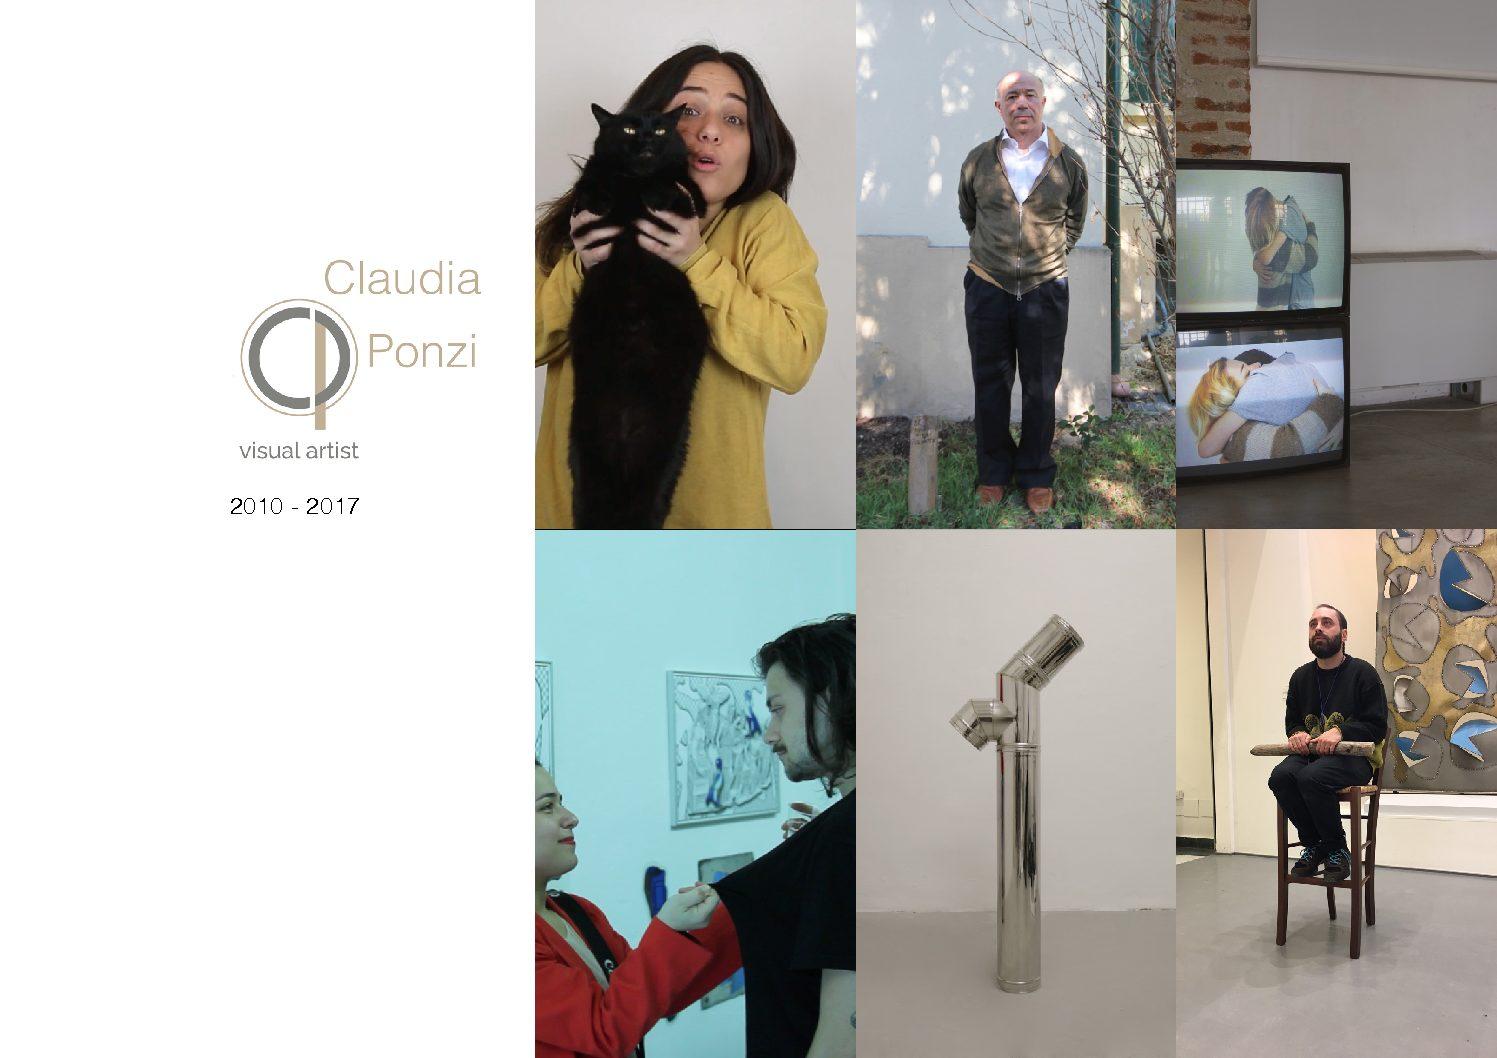 Claudia_Ponzi_donna_artista_Visual_Artist_arte_contemporanea